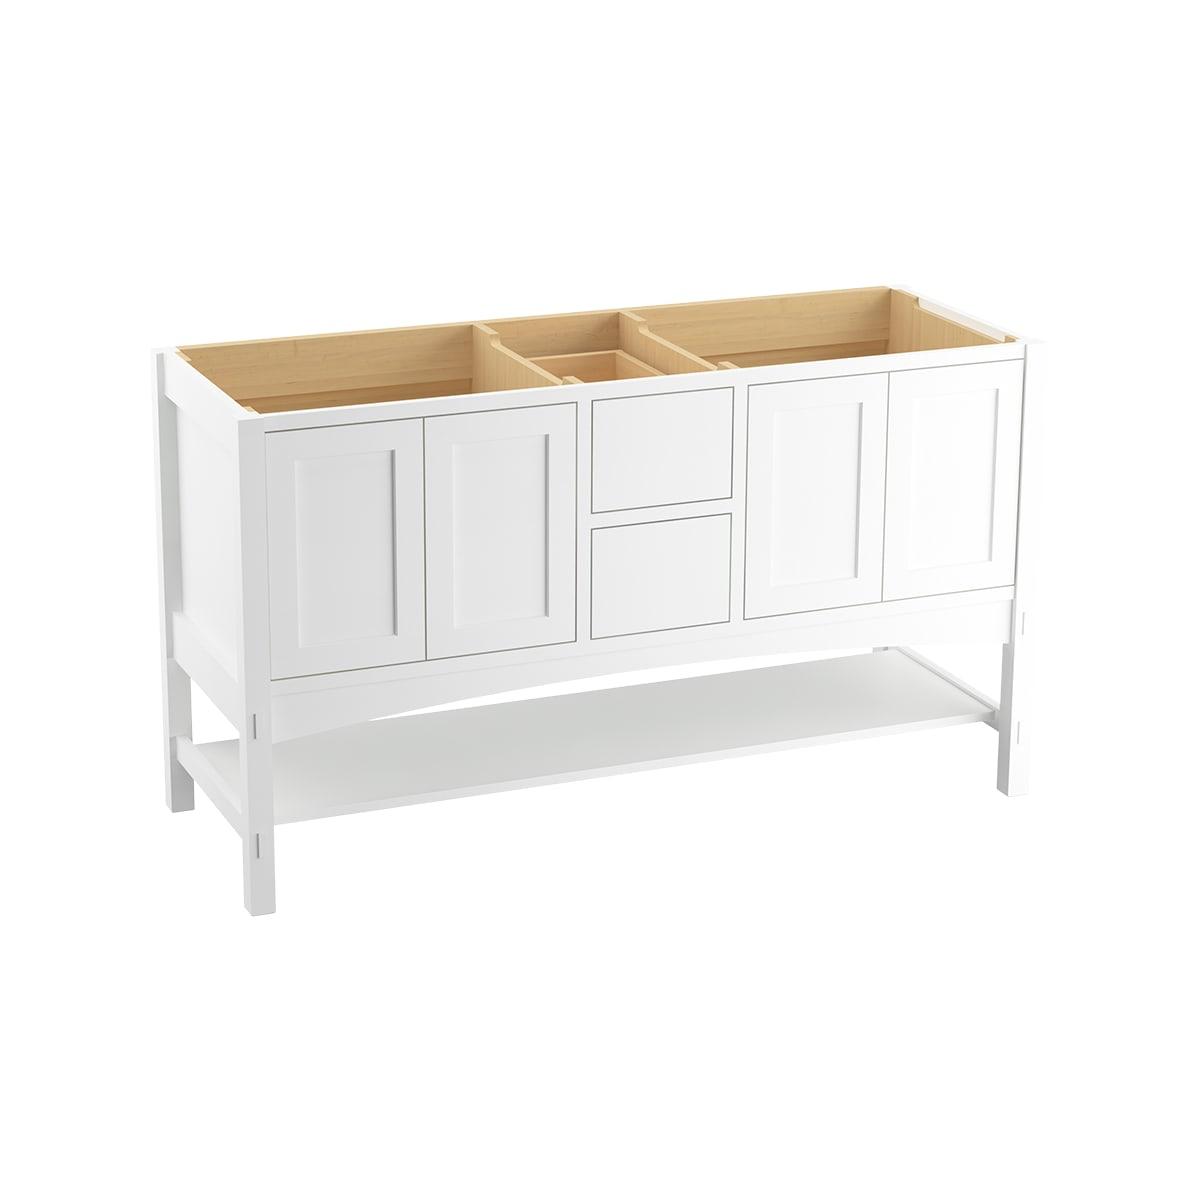 Kohler K 99559 1wa Linen White Marabou 60 Vanity Cabinet Only Free Standing Installation Type Faucet Com